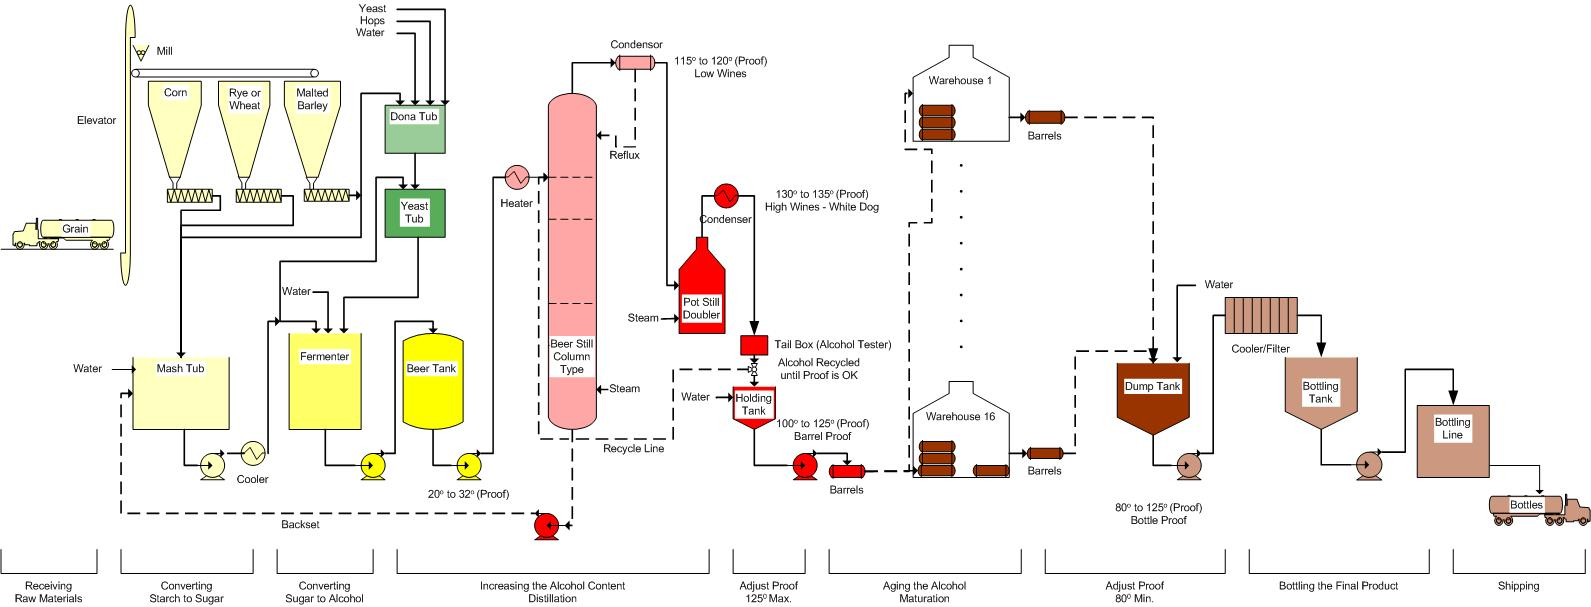 https://i1.wp.com/www.pfeiffer-history.com/Whiskey/Process%20Flow.jpg